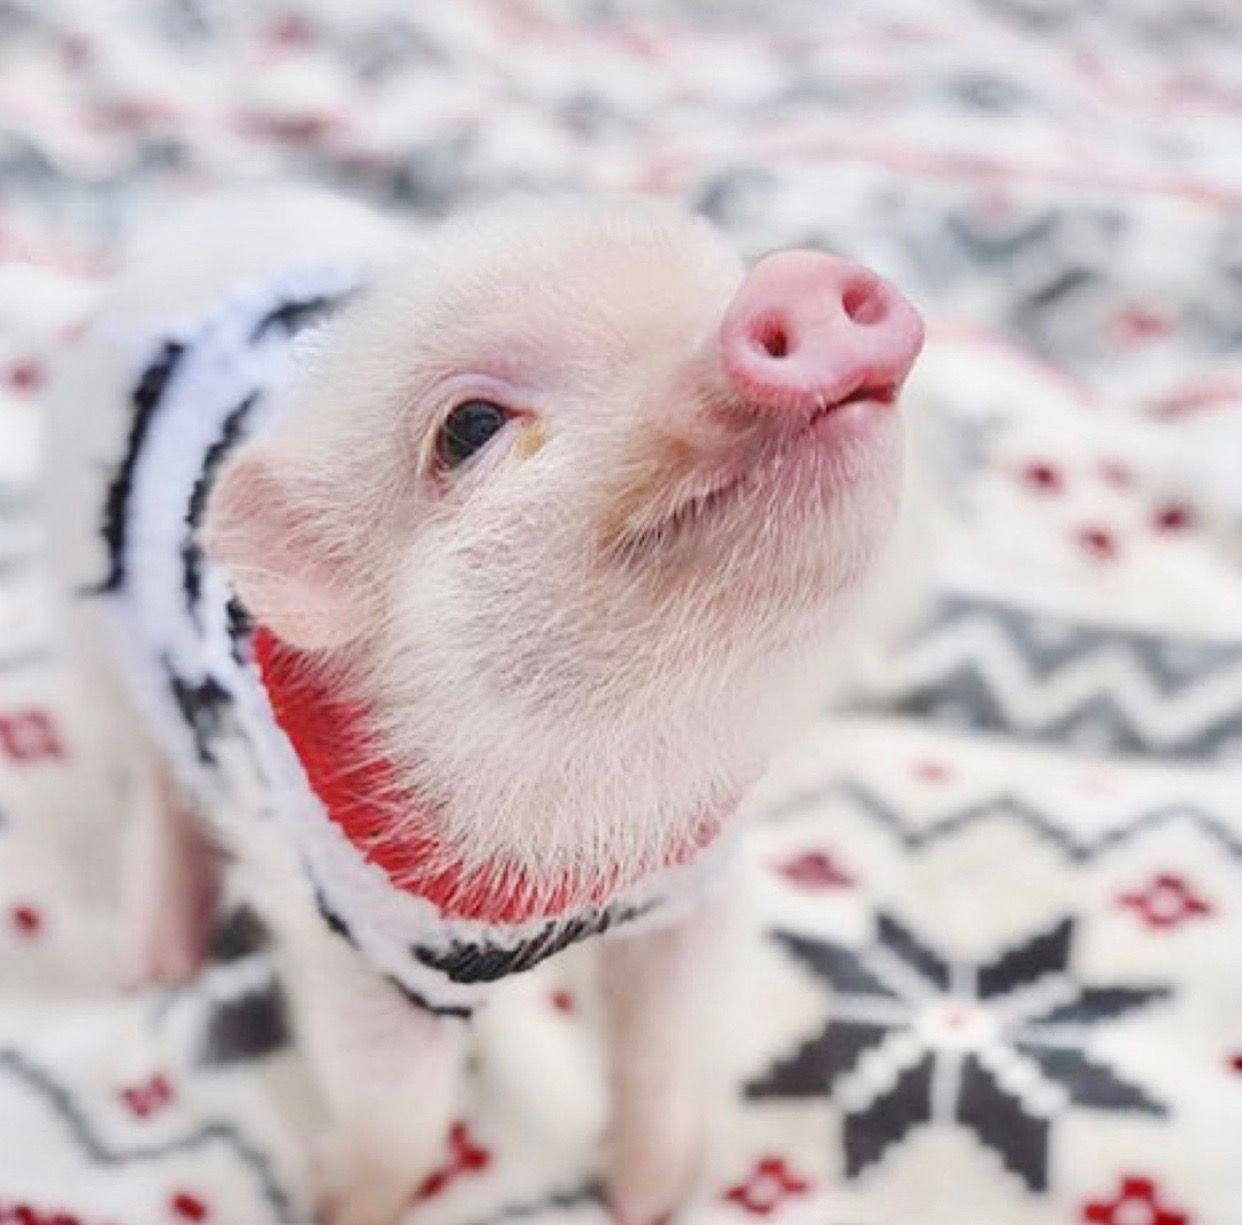 ️💗🖤 Cute baby pigs, Cute piglets, Cute pigs